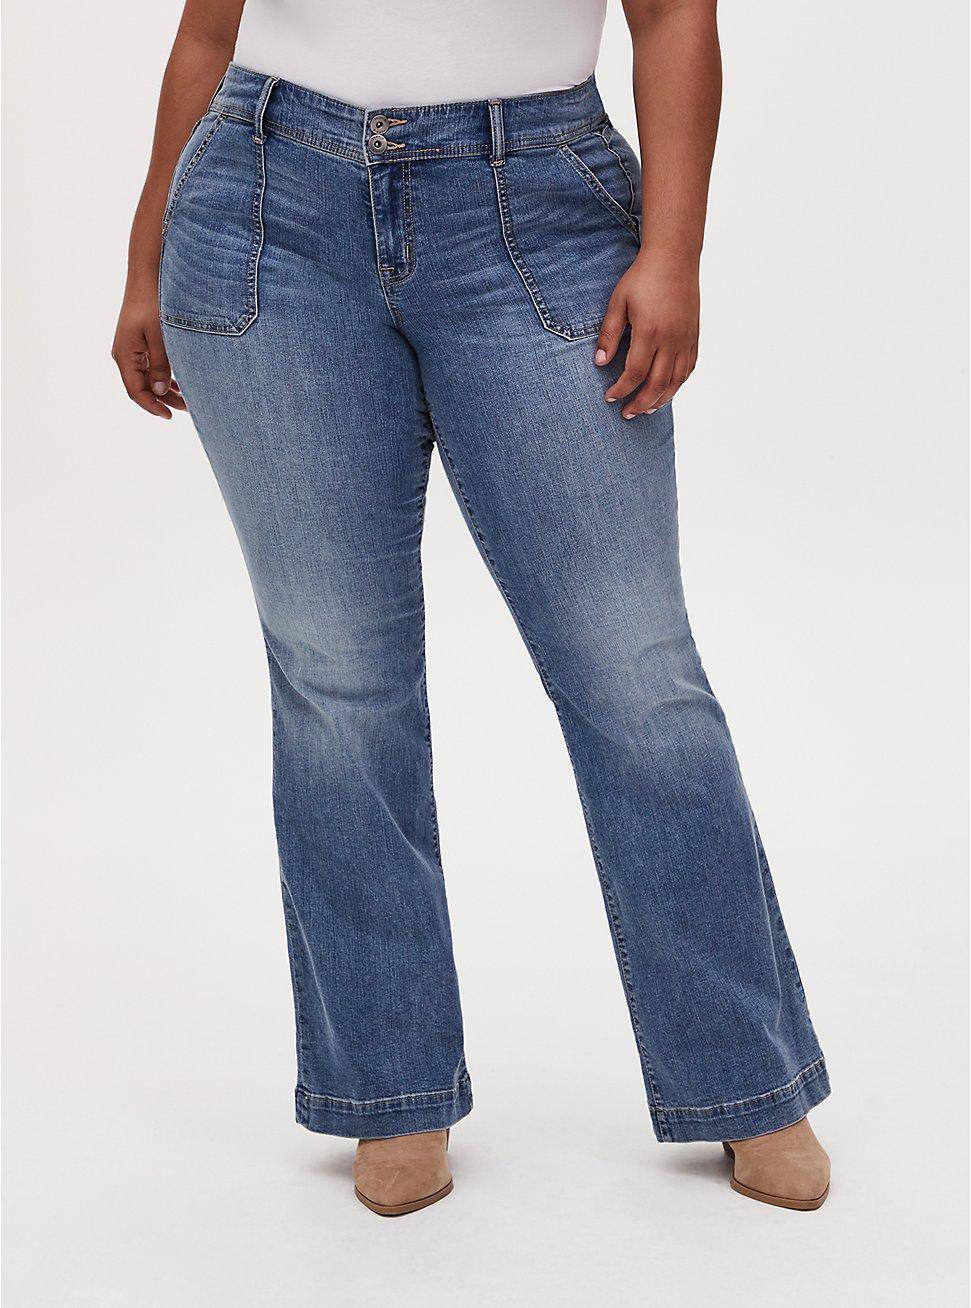 Mid Rise Flare Jean - Vintage Stretch Medium Wash , KIKI, hi-res